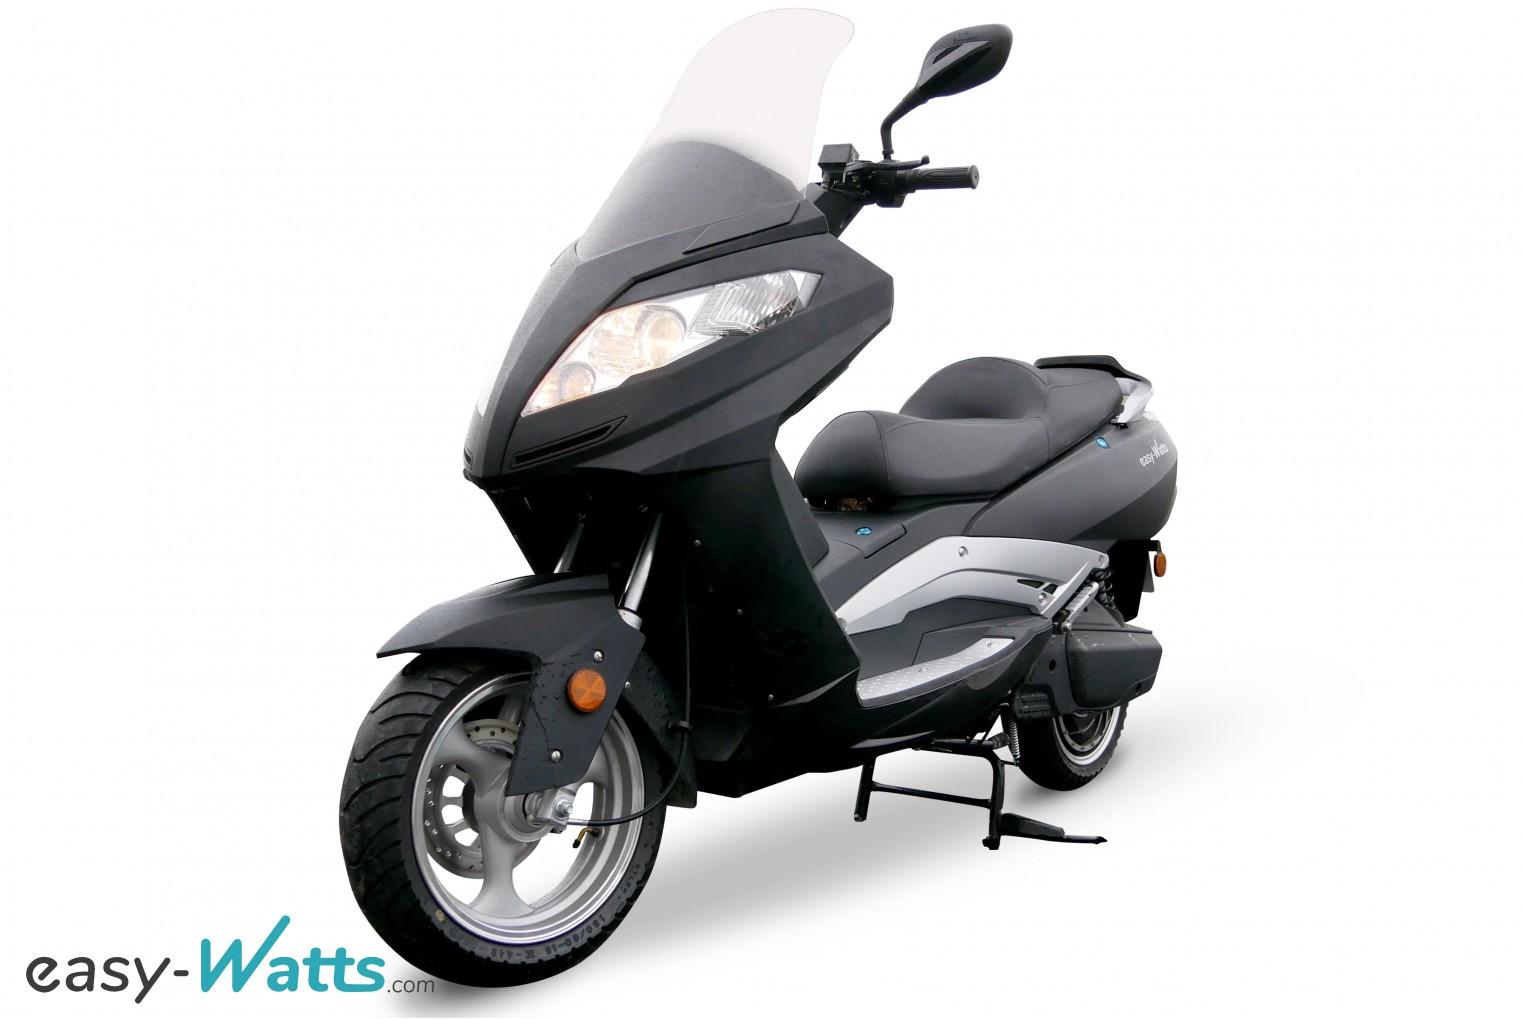 maxi scooter lectrique e jet de 9000 watts. Black Bedroom Furniture Sets. Home Design Ideas